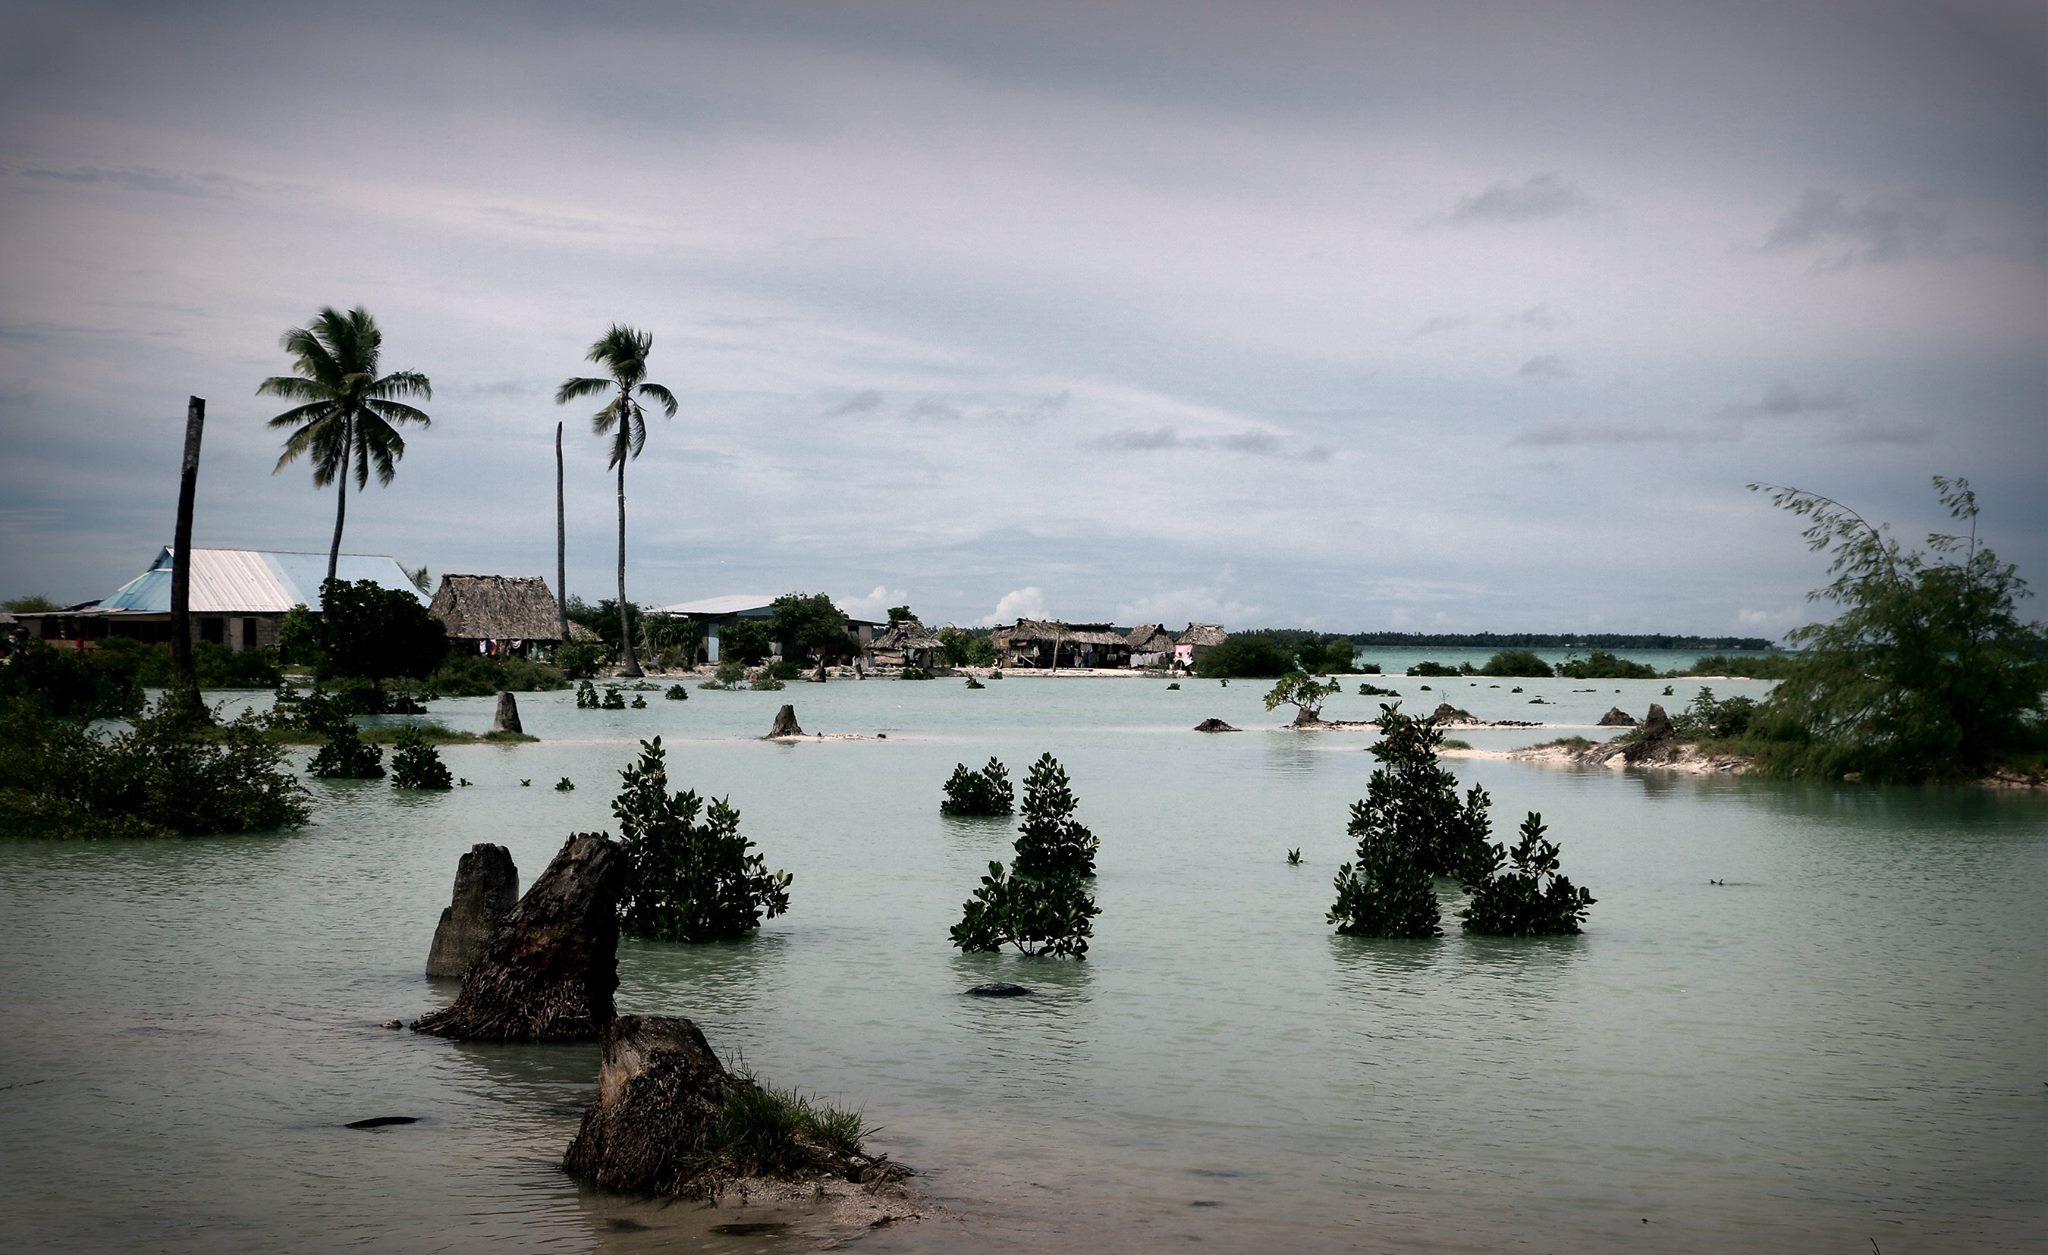 Kiribati after a recent King Tide. Photo by FentonLutunatabua.